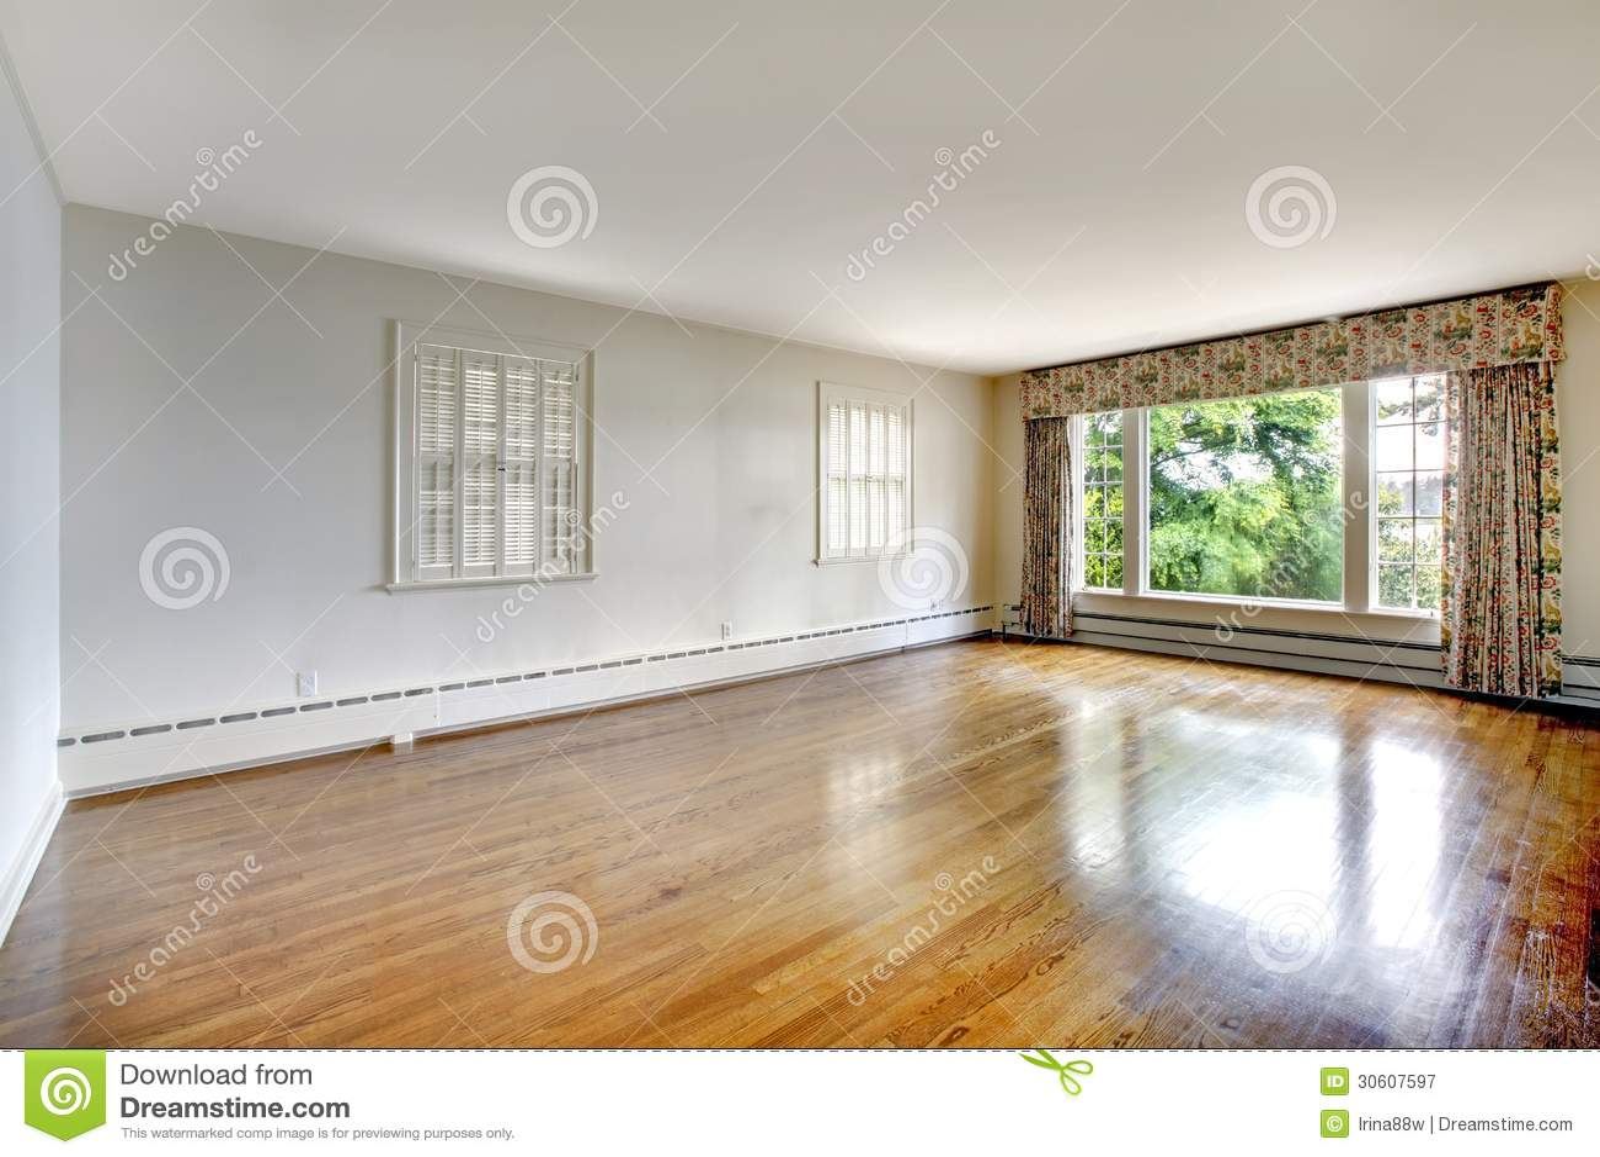 Large Elegant Luxury Historical Home Empty Bedroom